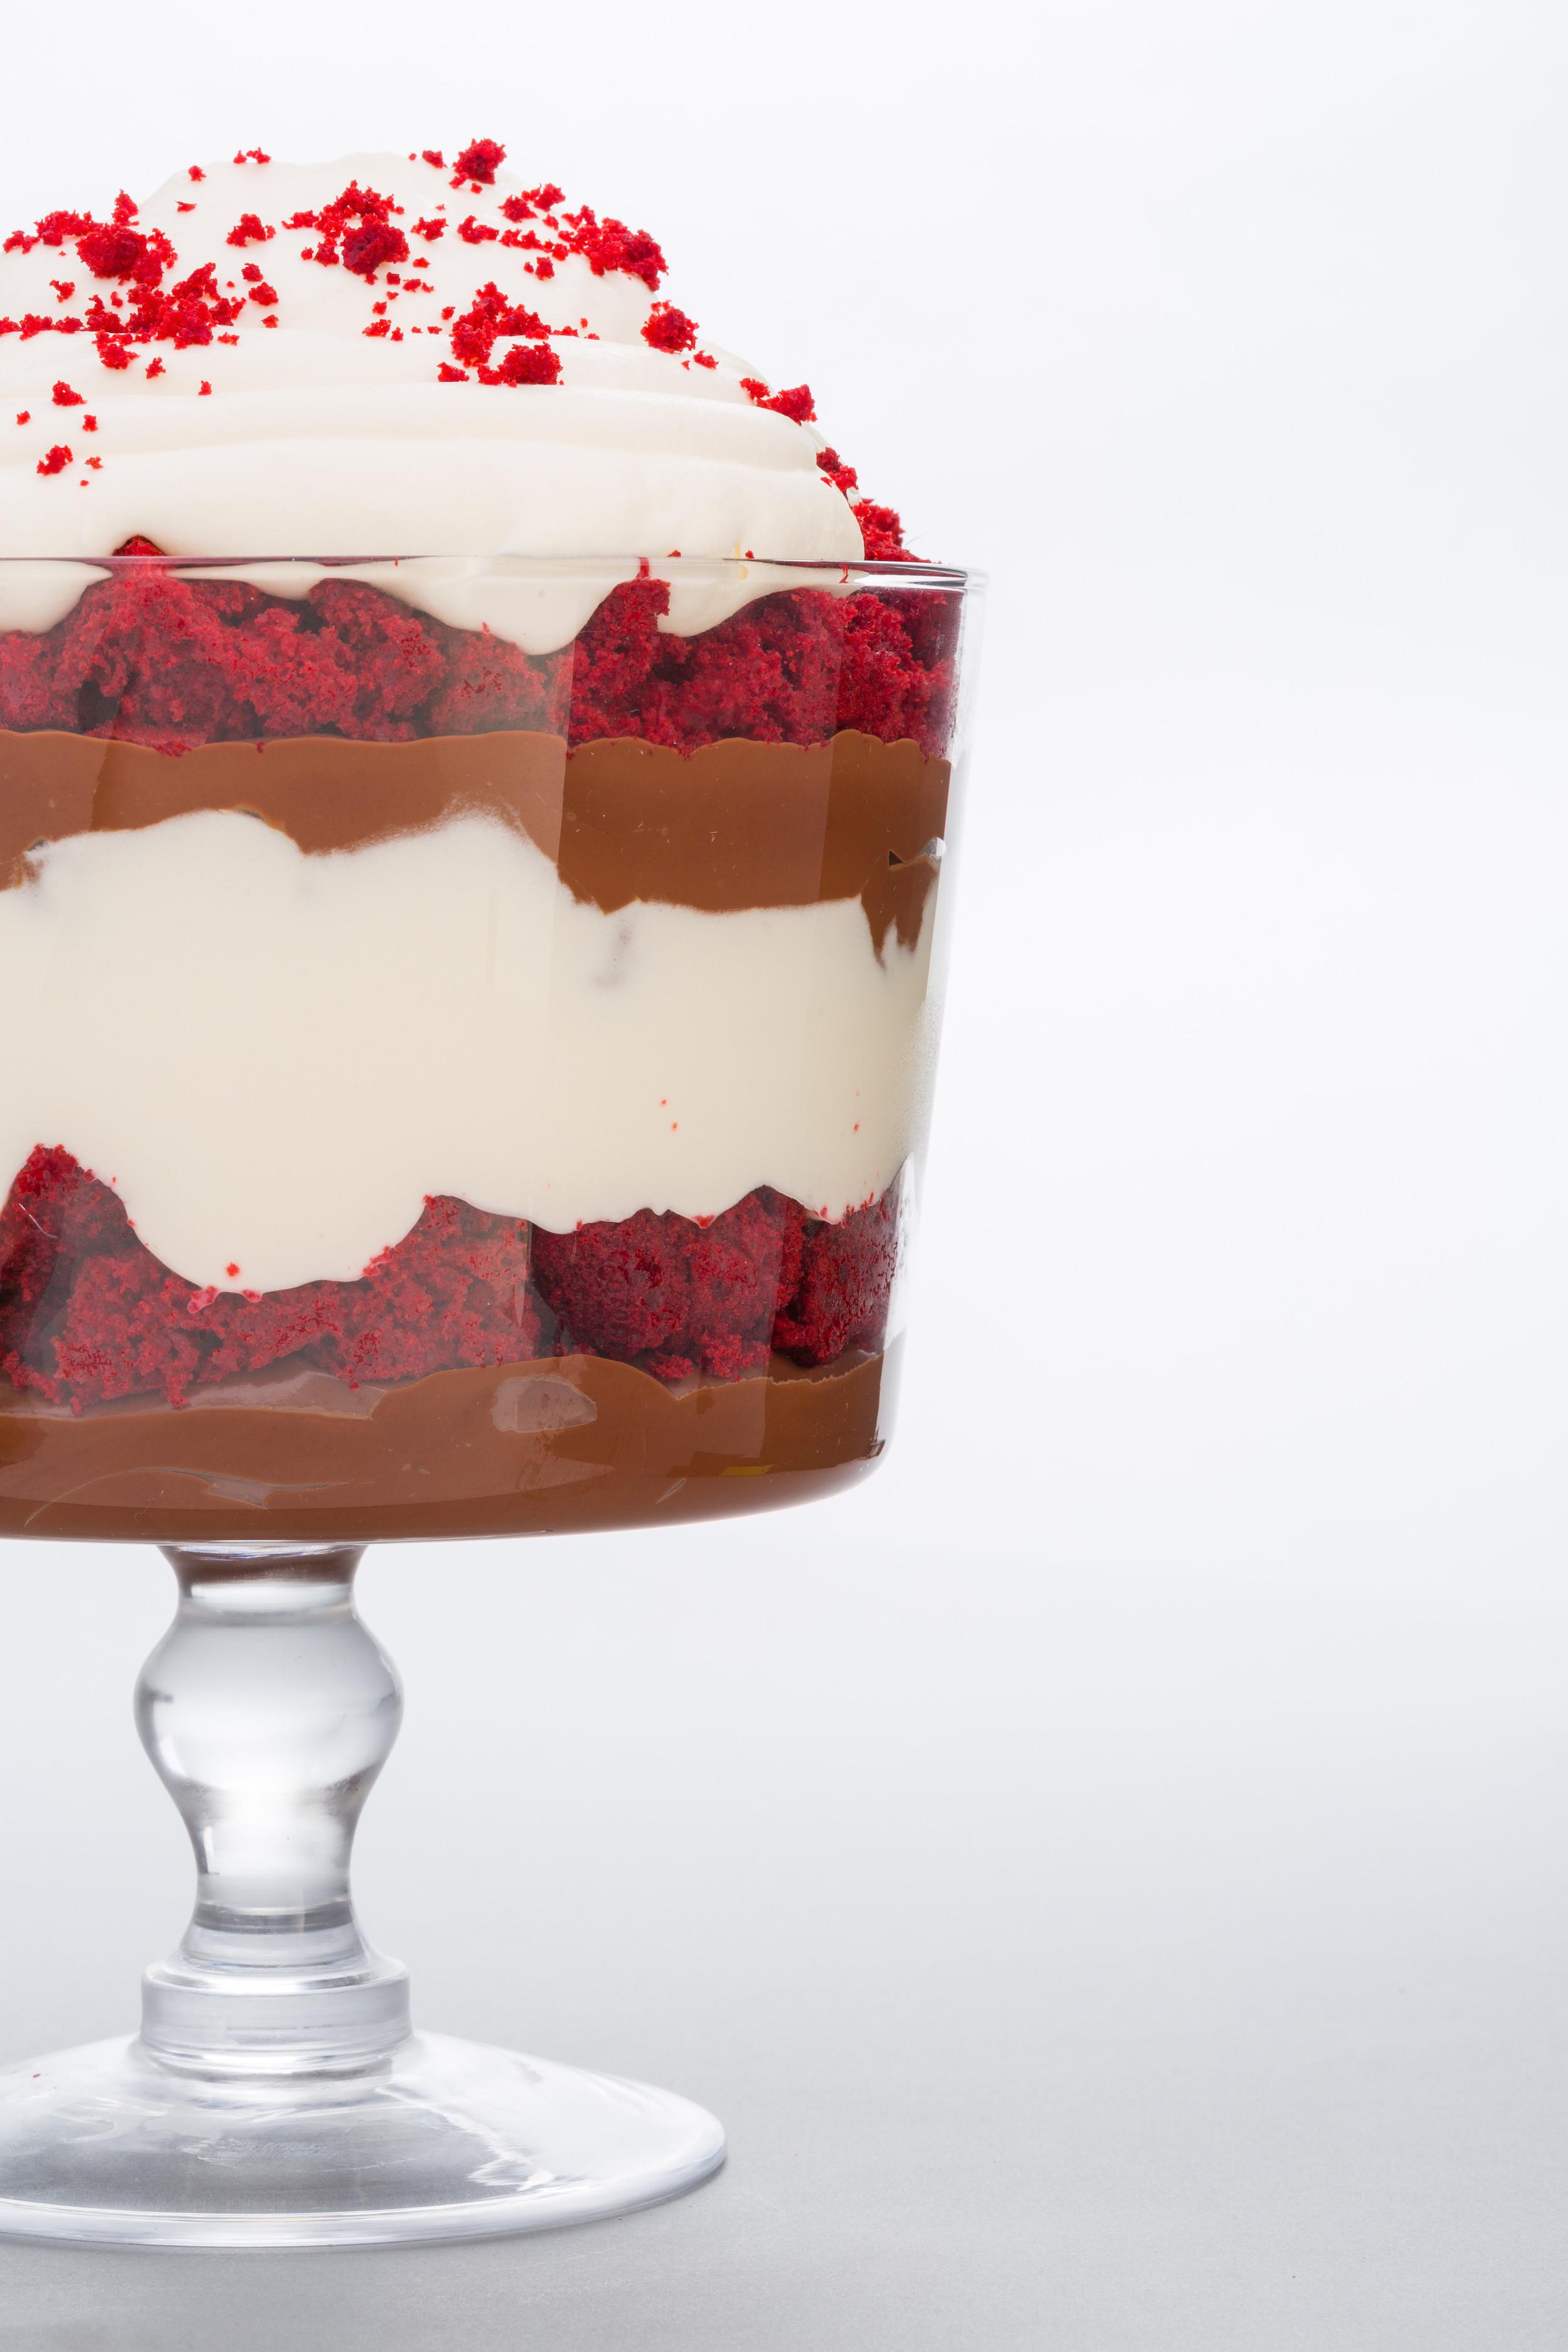 Christmas Trifle Dessert  11 Christmas Trifle Recipes Easy Holiday Trifle Desserts